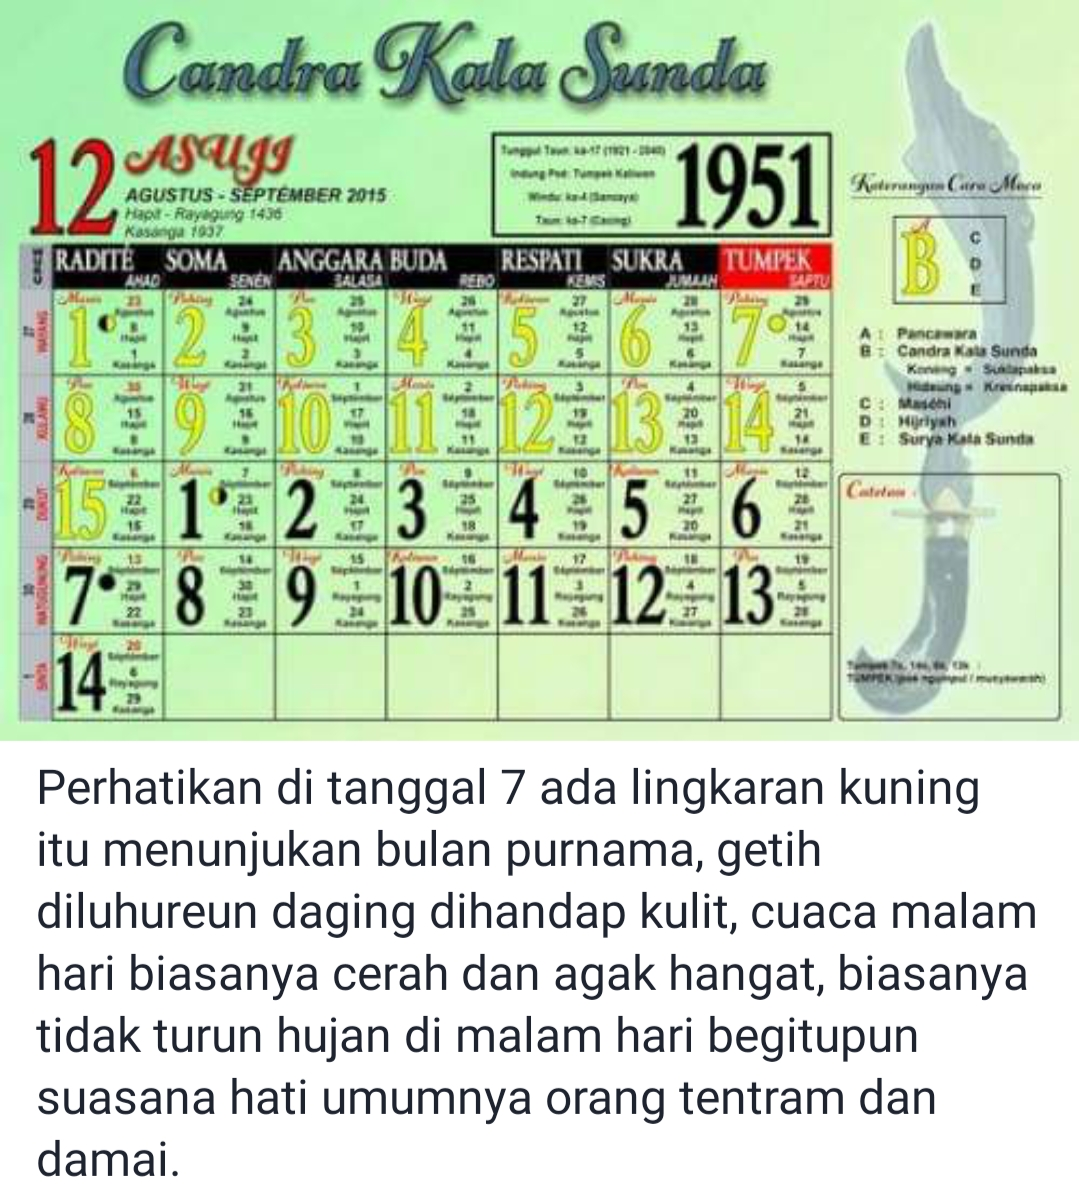 KALA IDER Kalender SUNDA   WARTA SUNDA ONLINE   Grup Majalah ...